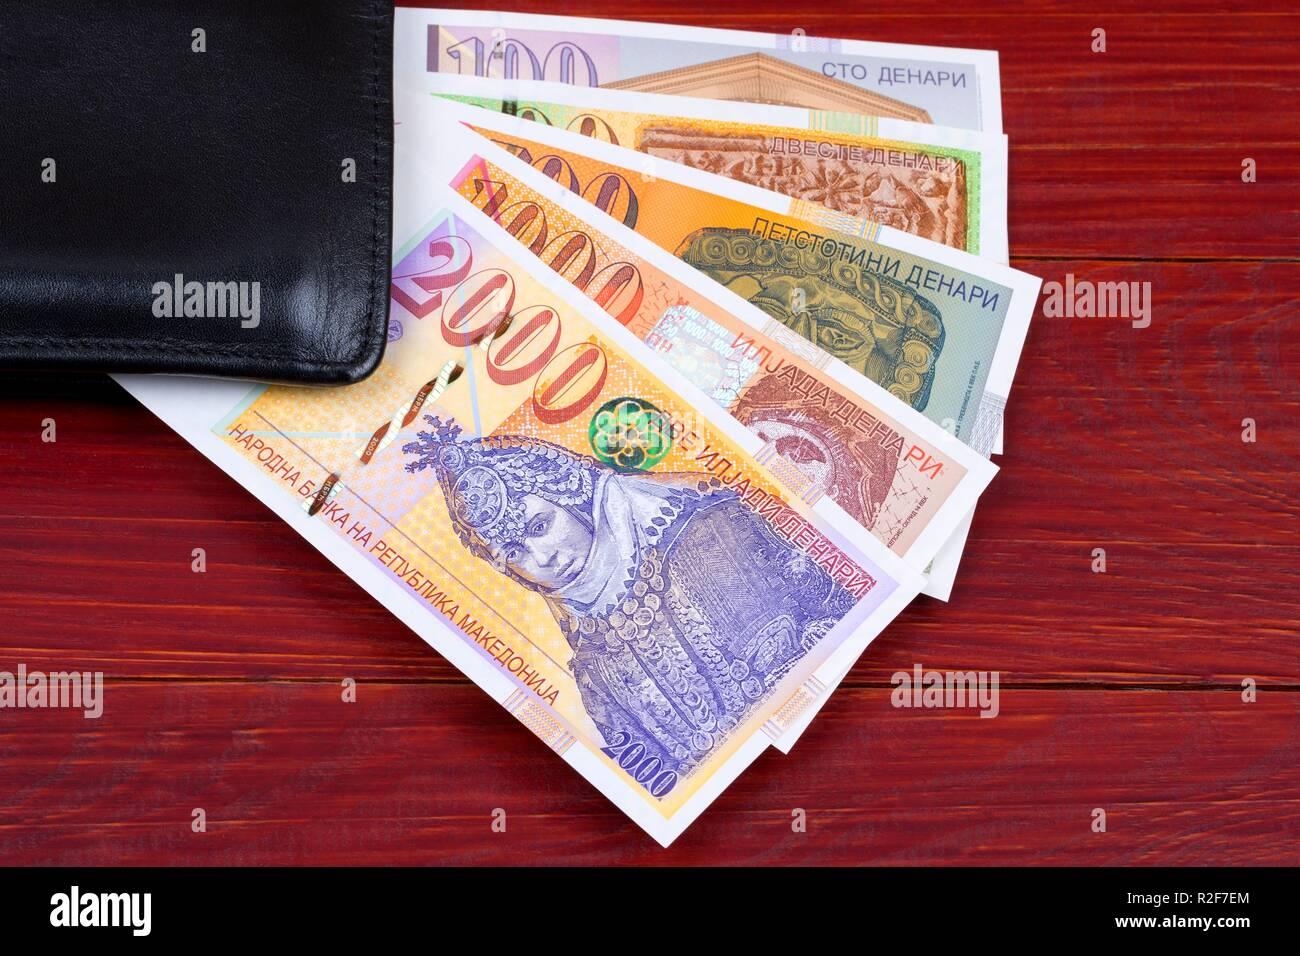 Macedonian Money Stock Photos & Macedonian Money Stock